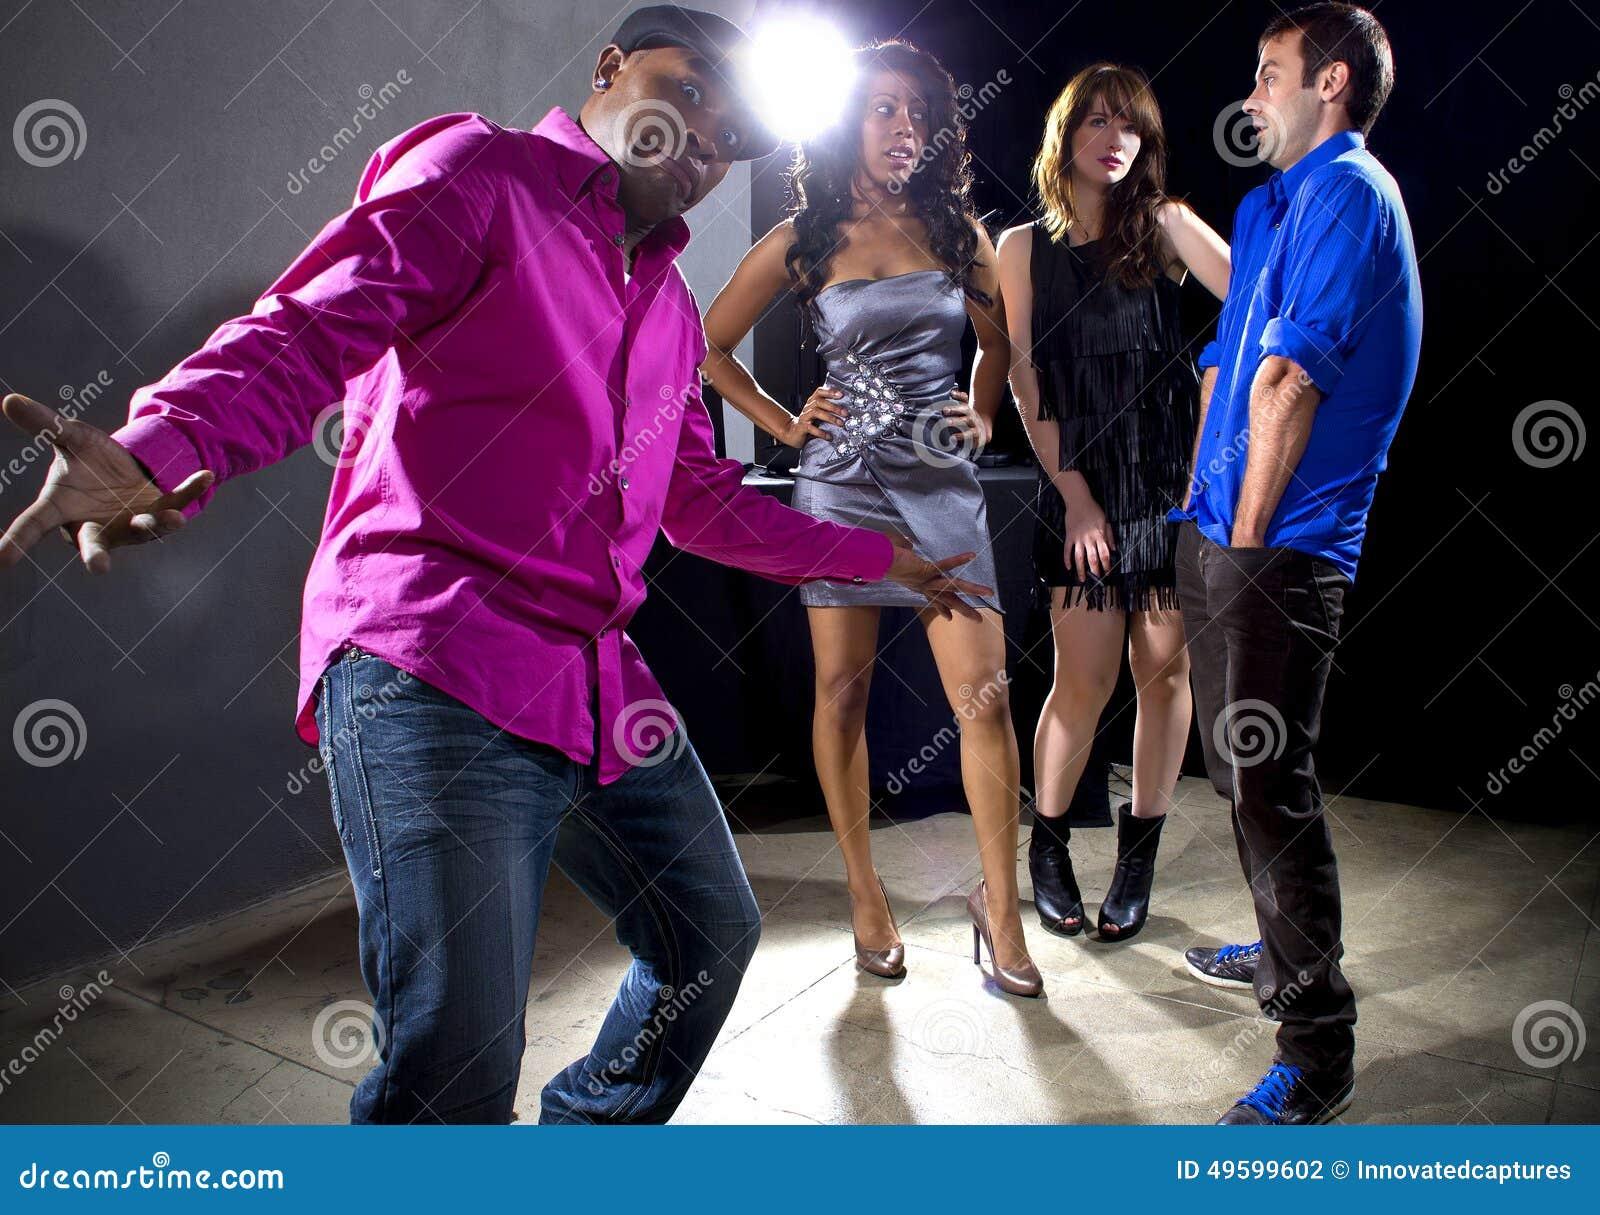 [Image: getting-rejected-girls-nightclub-laughin...599602.jpg]